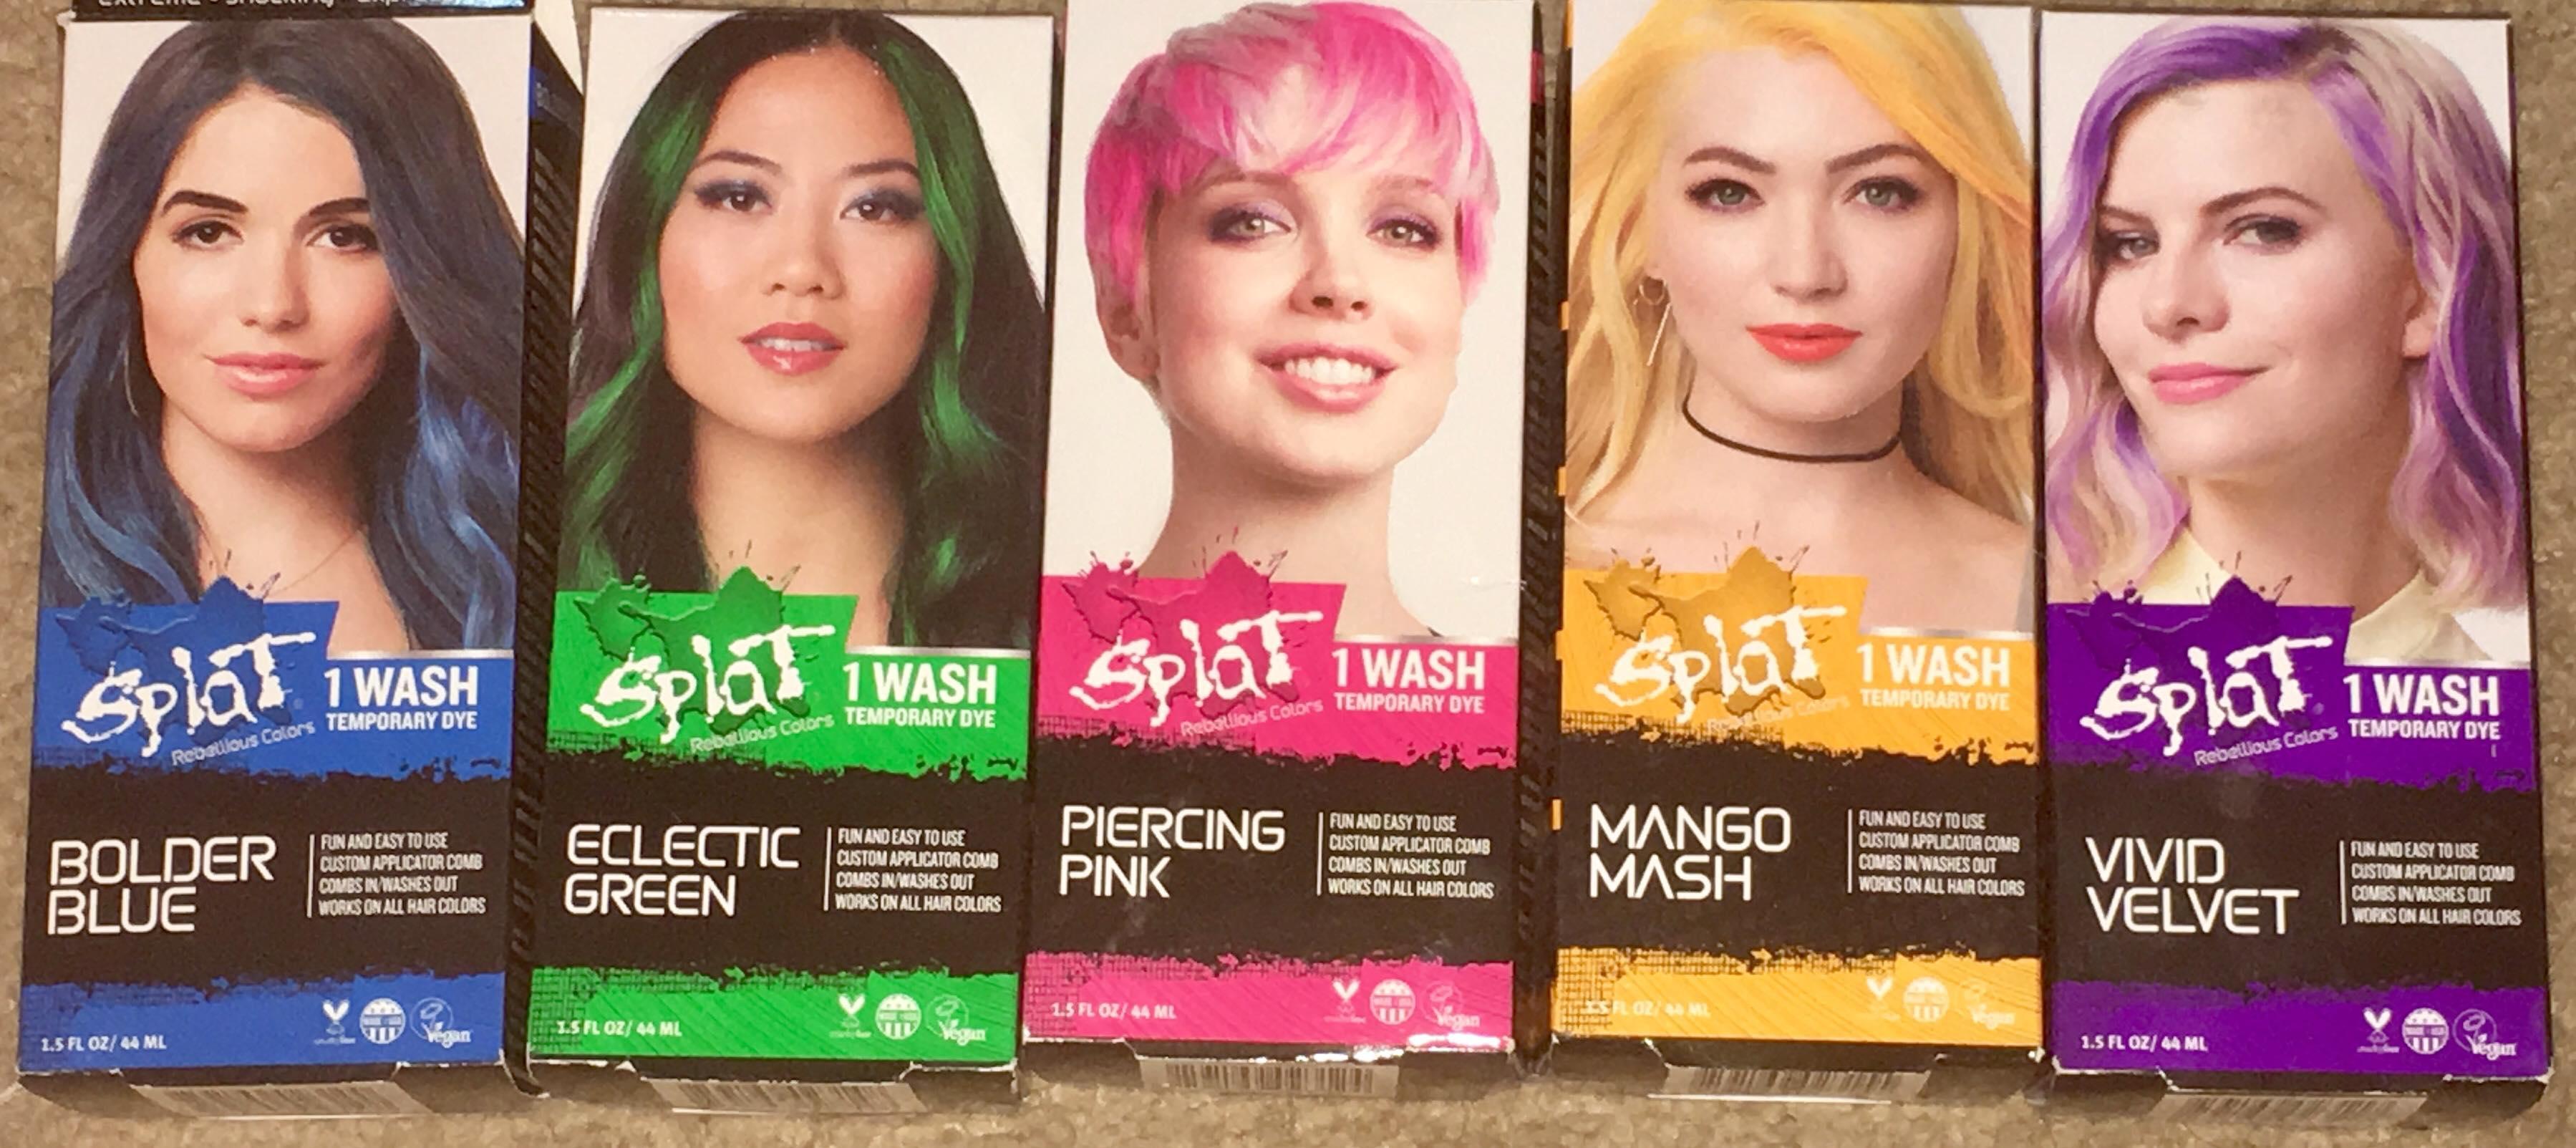 Splat 1 Wash Temporary Dye | Things That Make People Go Aww